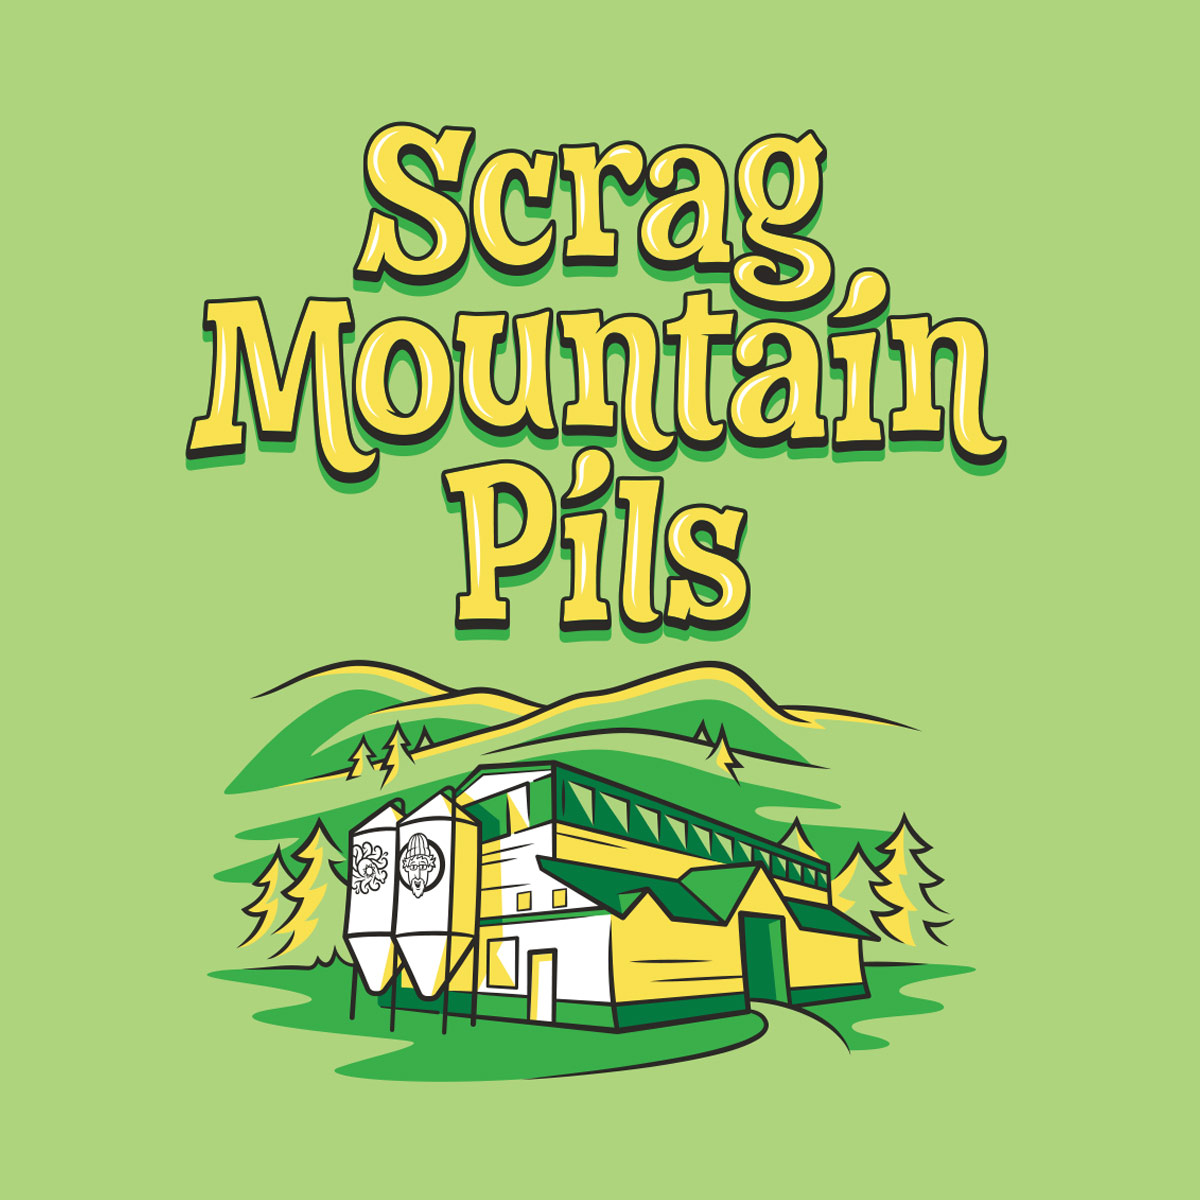 Scrag Mountain Pils